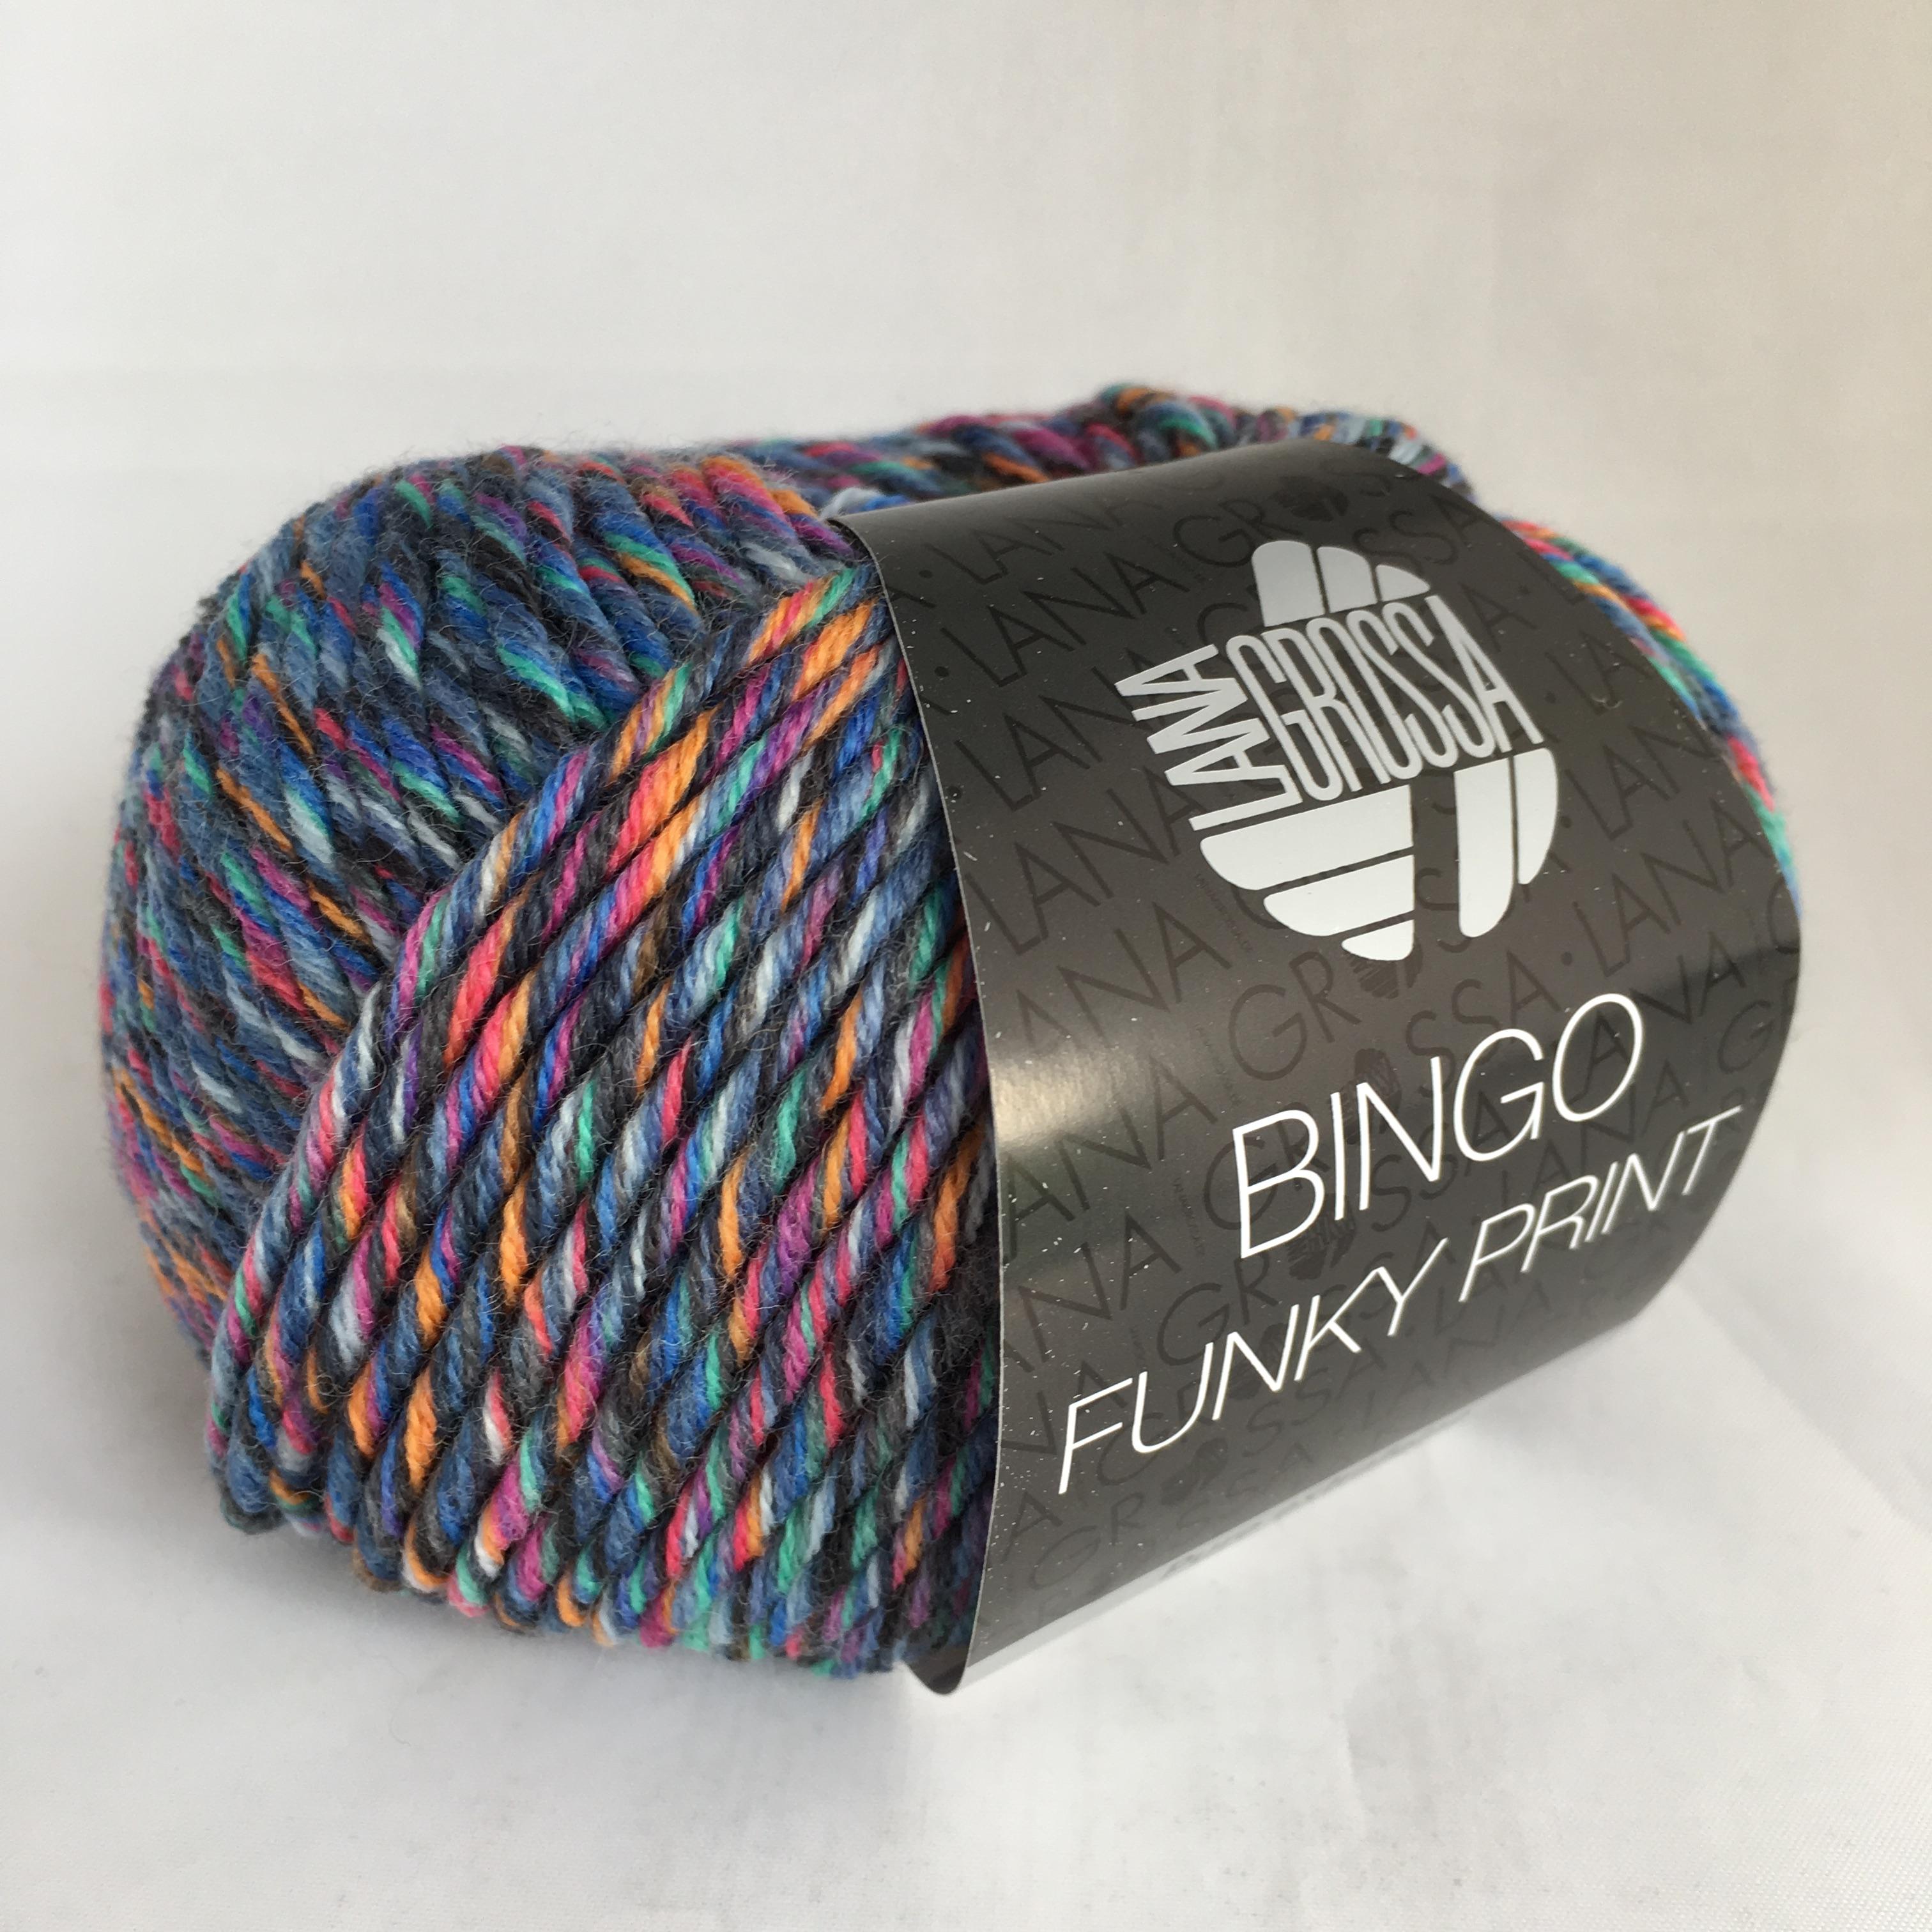 Bingo Funky Print